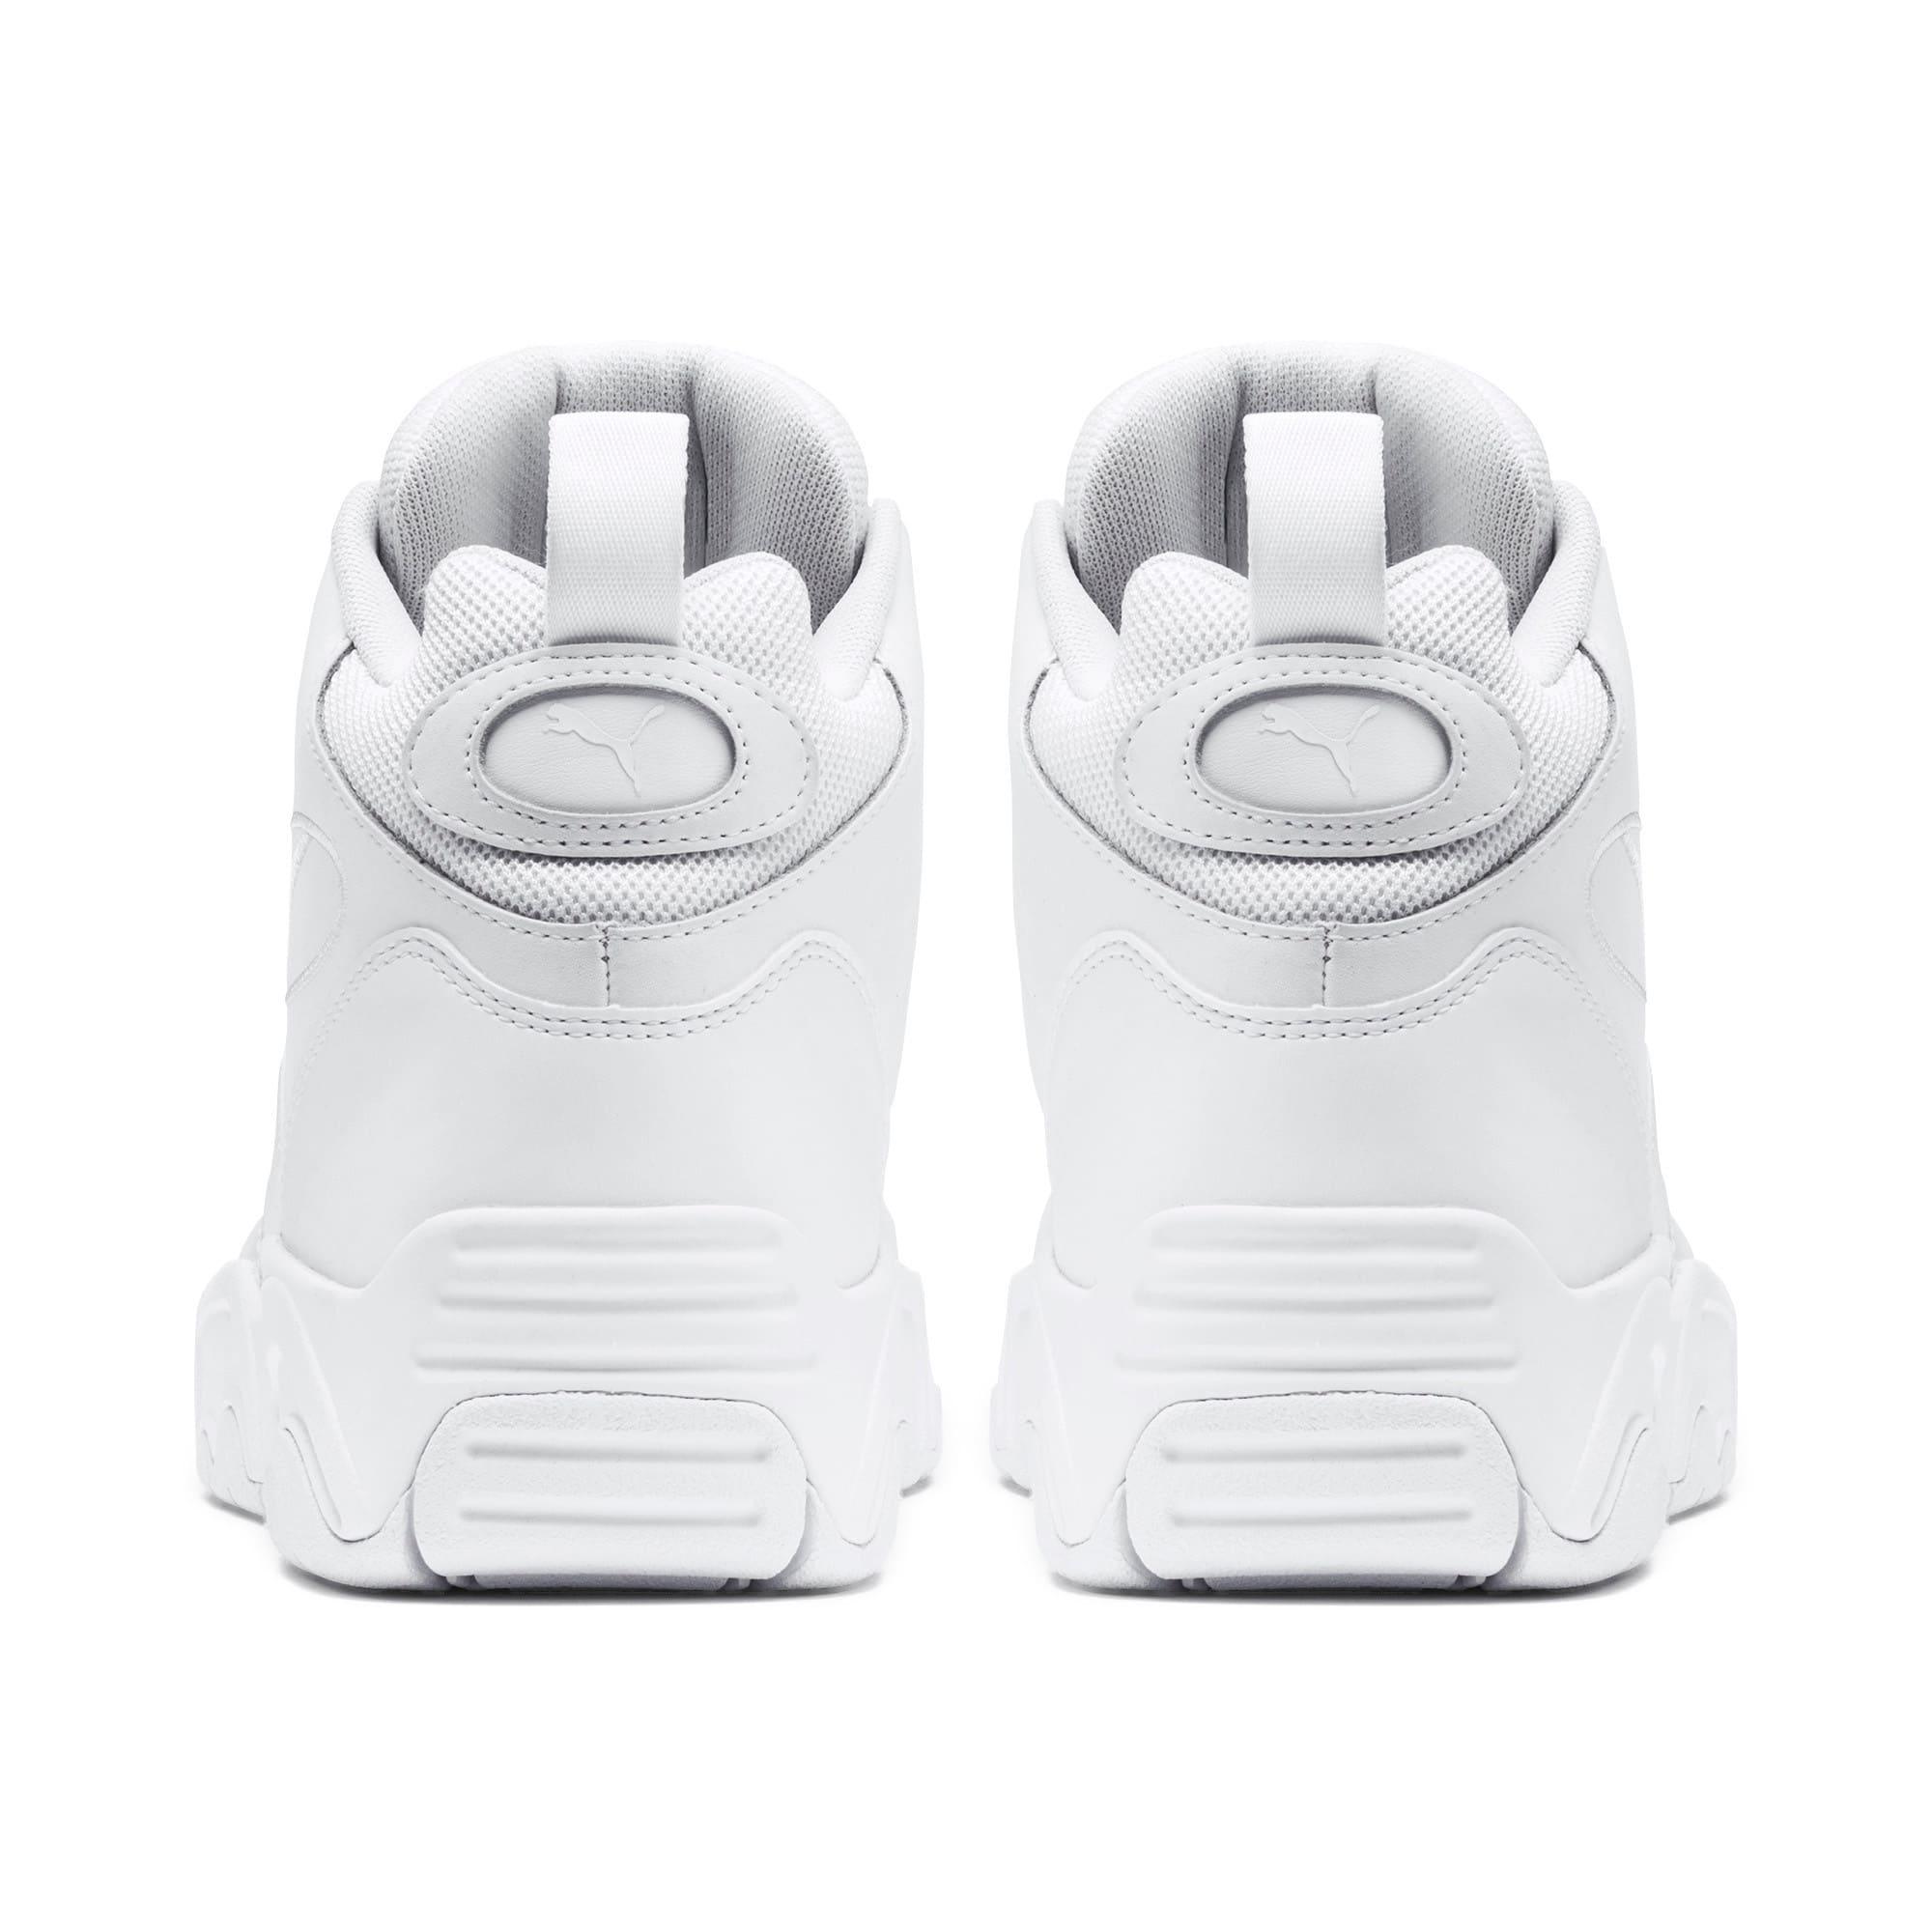 Thumbnail 4 of Source Mid Sneakers, Puma Black-Puma White, medium